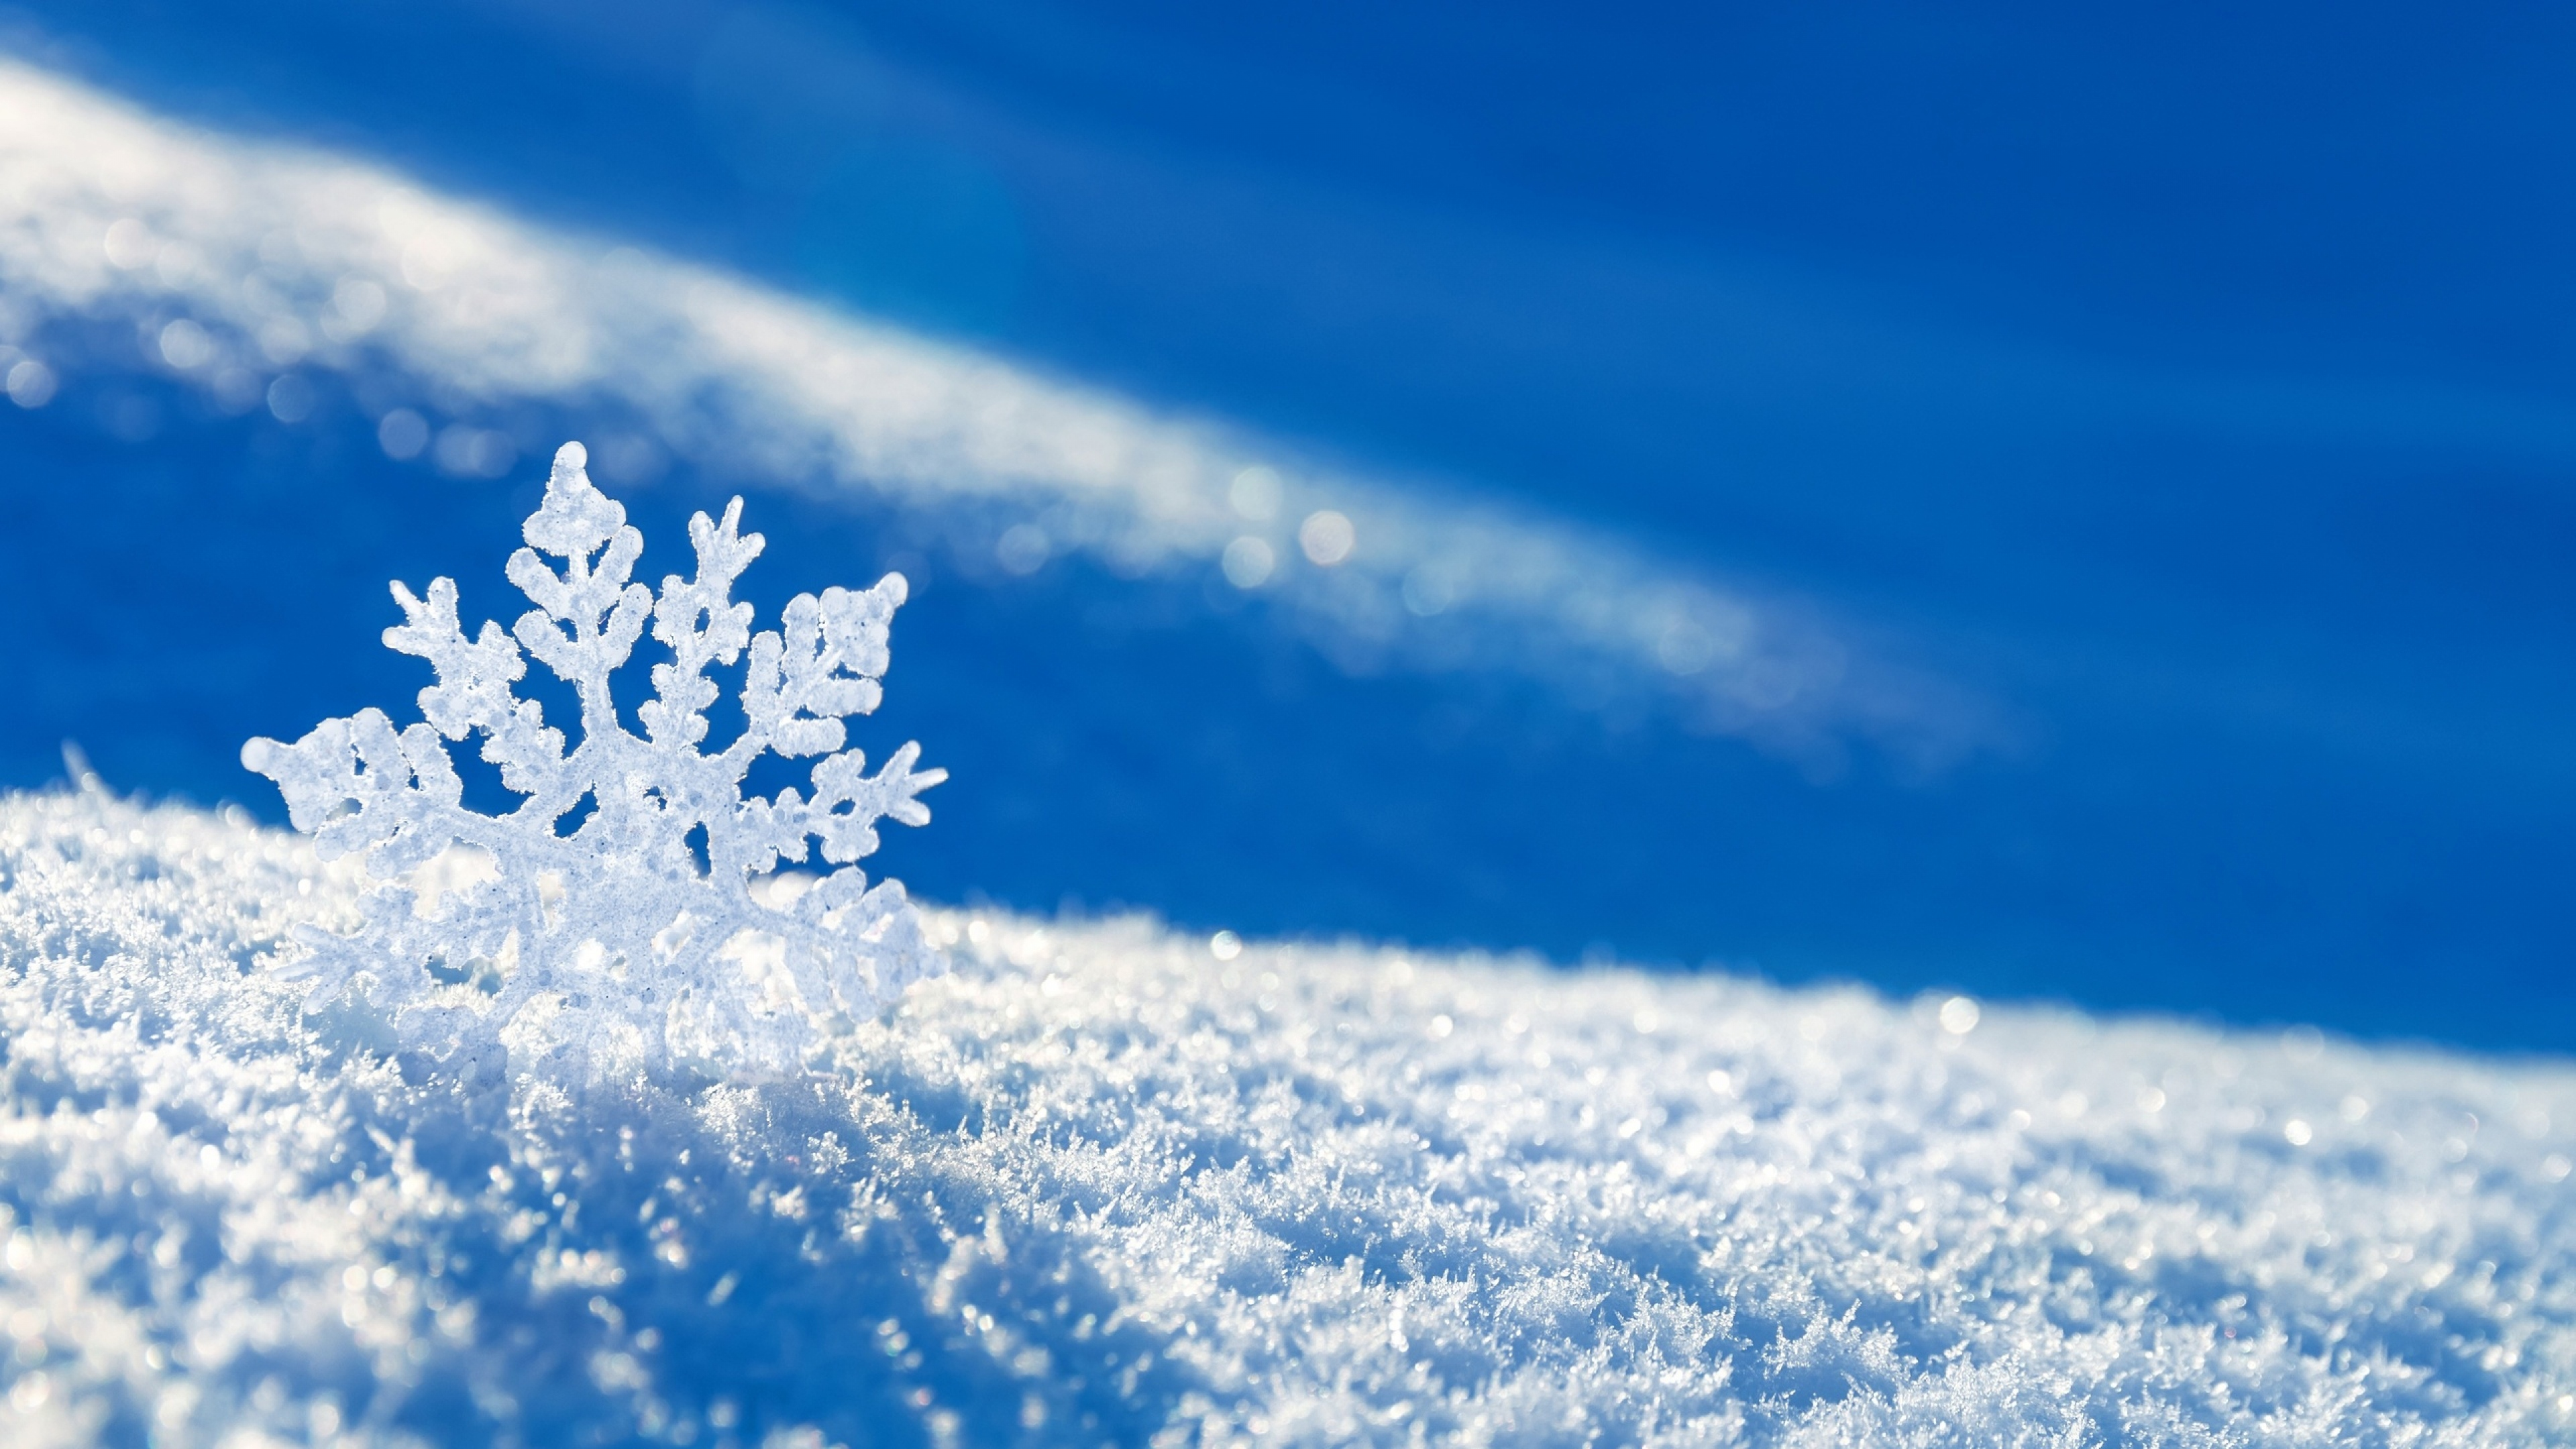 Snowy HD Wallpapers 3840x2160 - WallpaperSafari